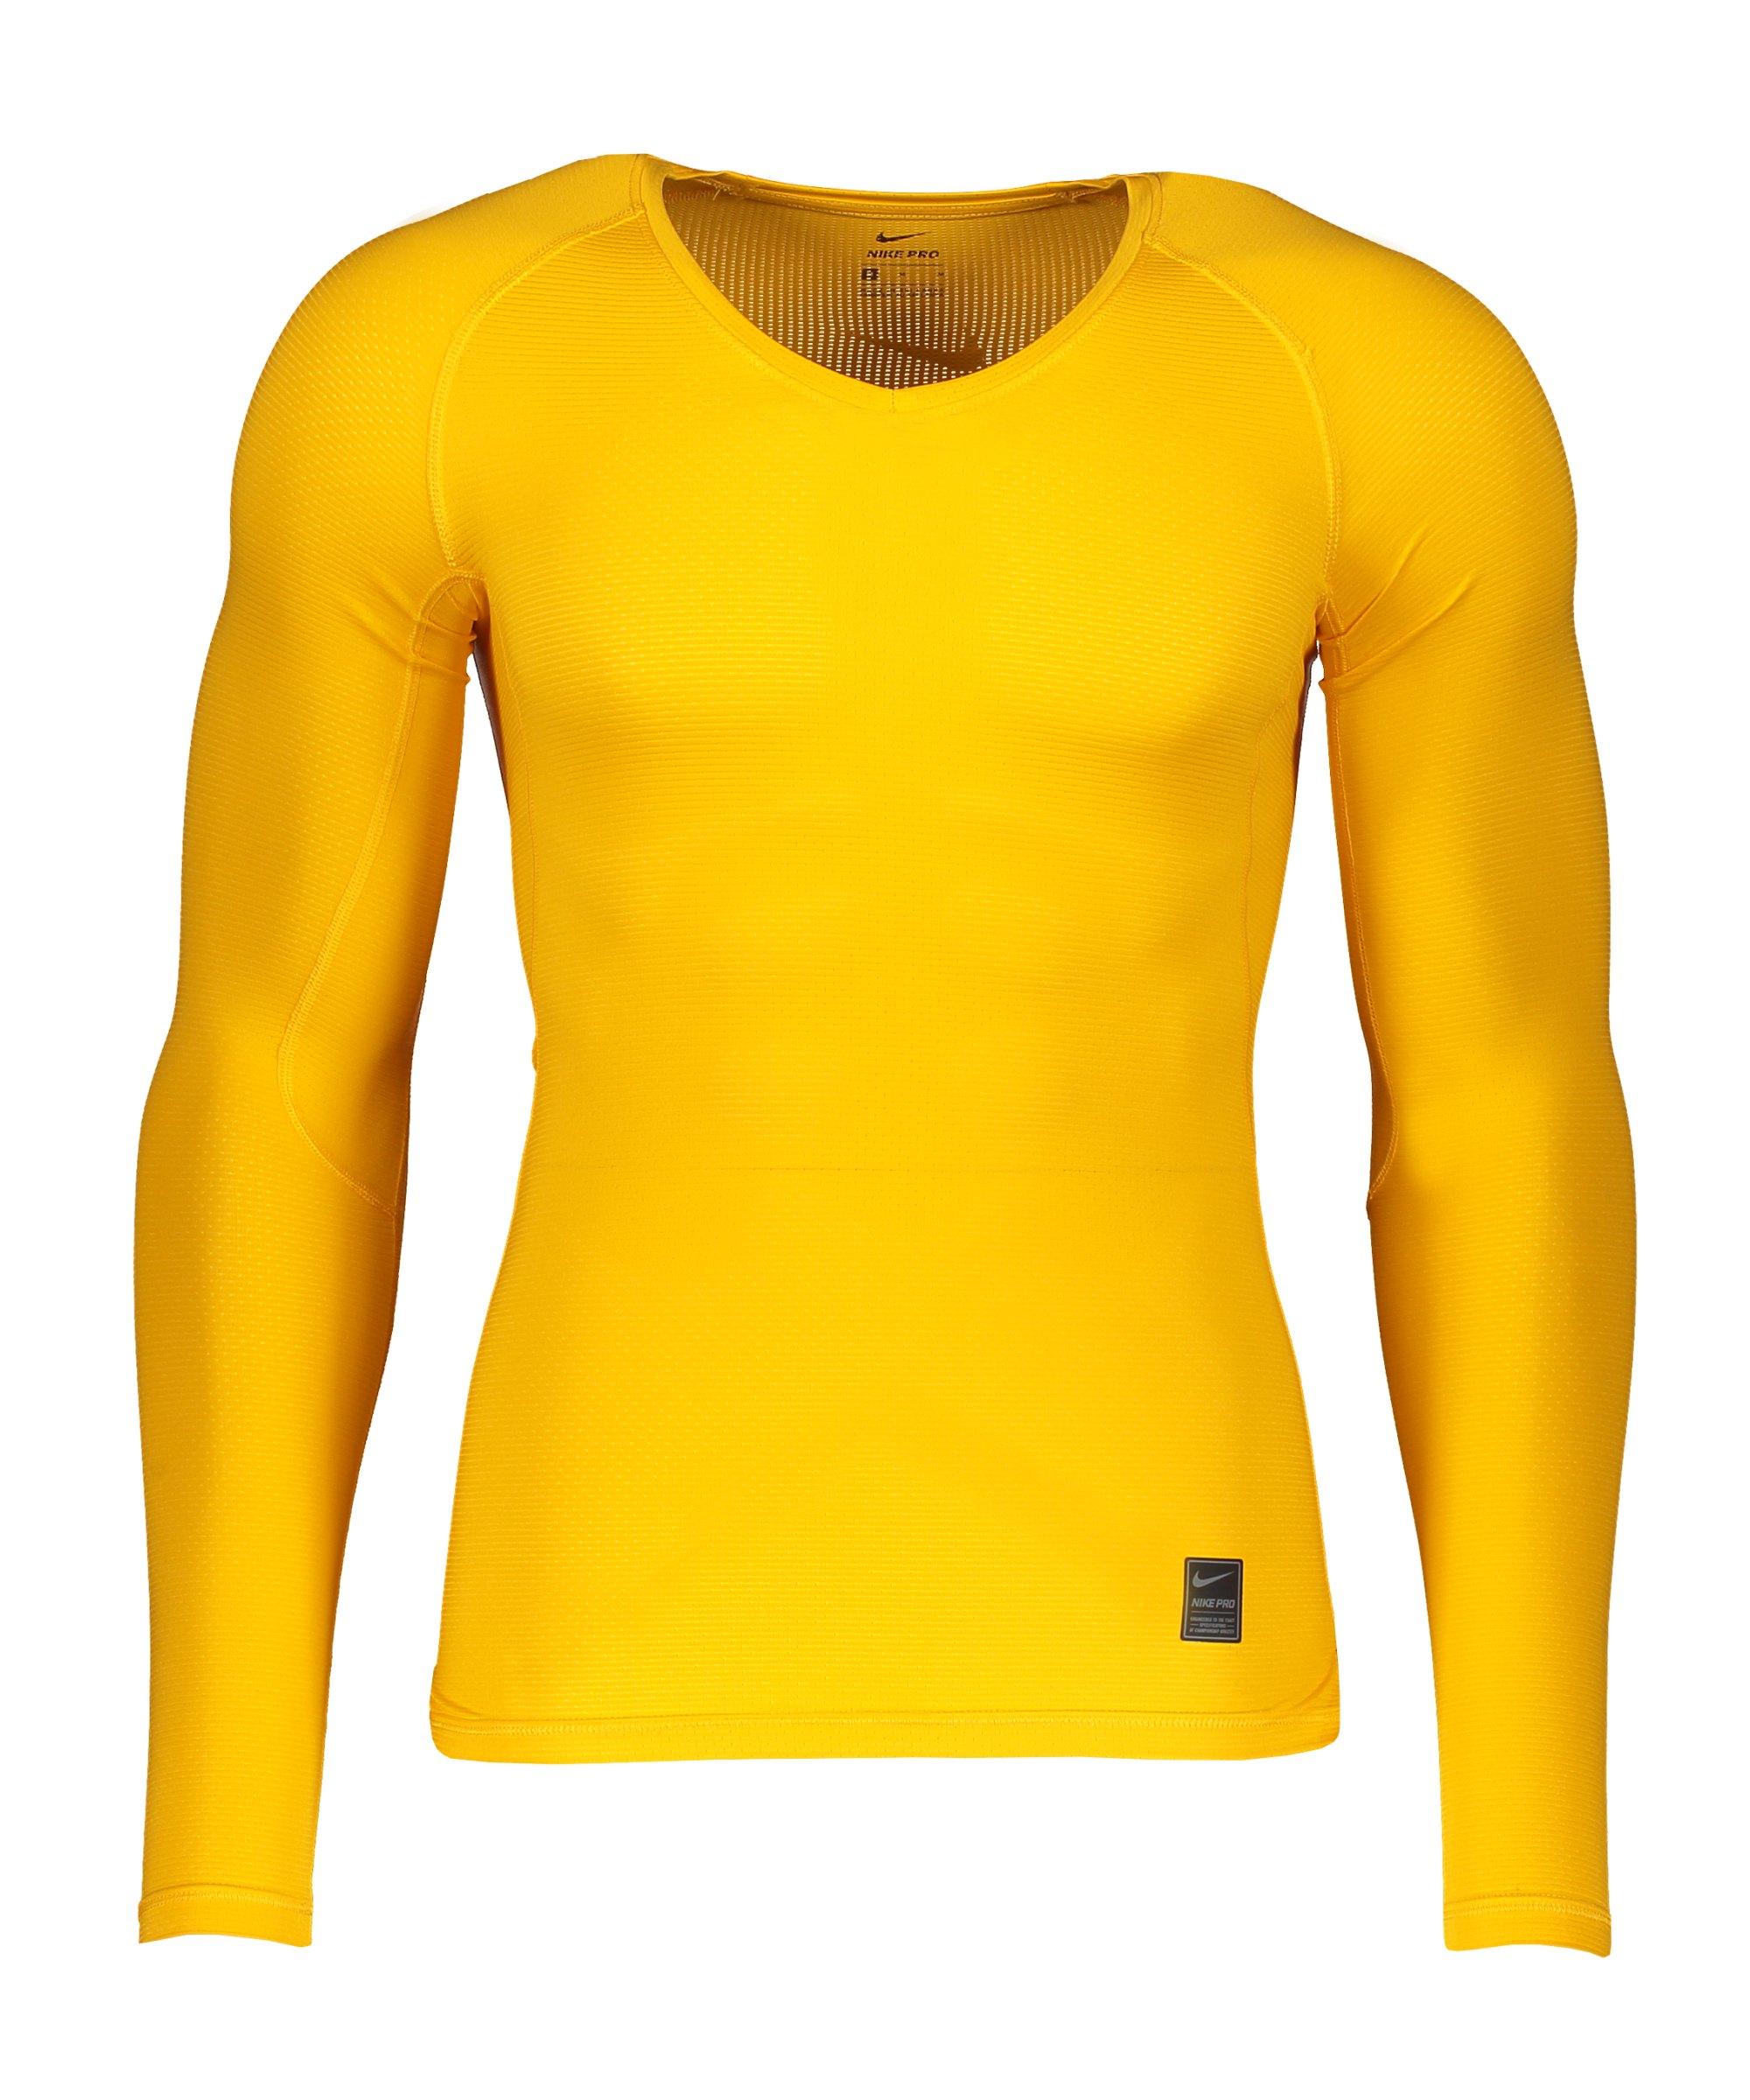 Nike Pro Hypercool Comp Shirt langarm F739 - gelb